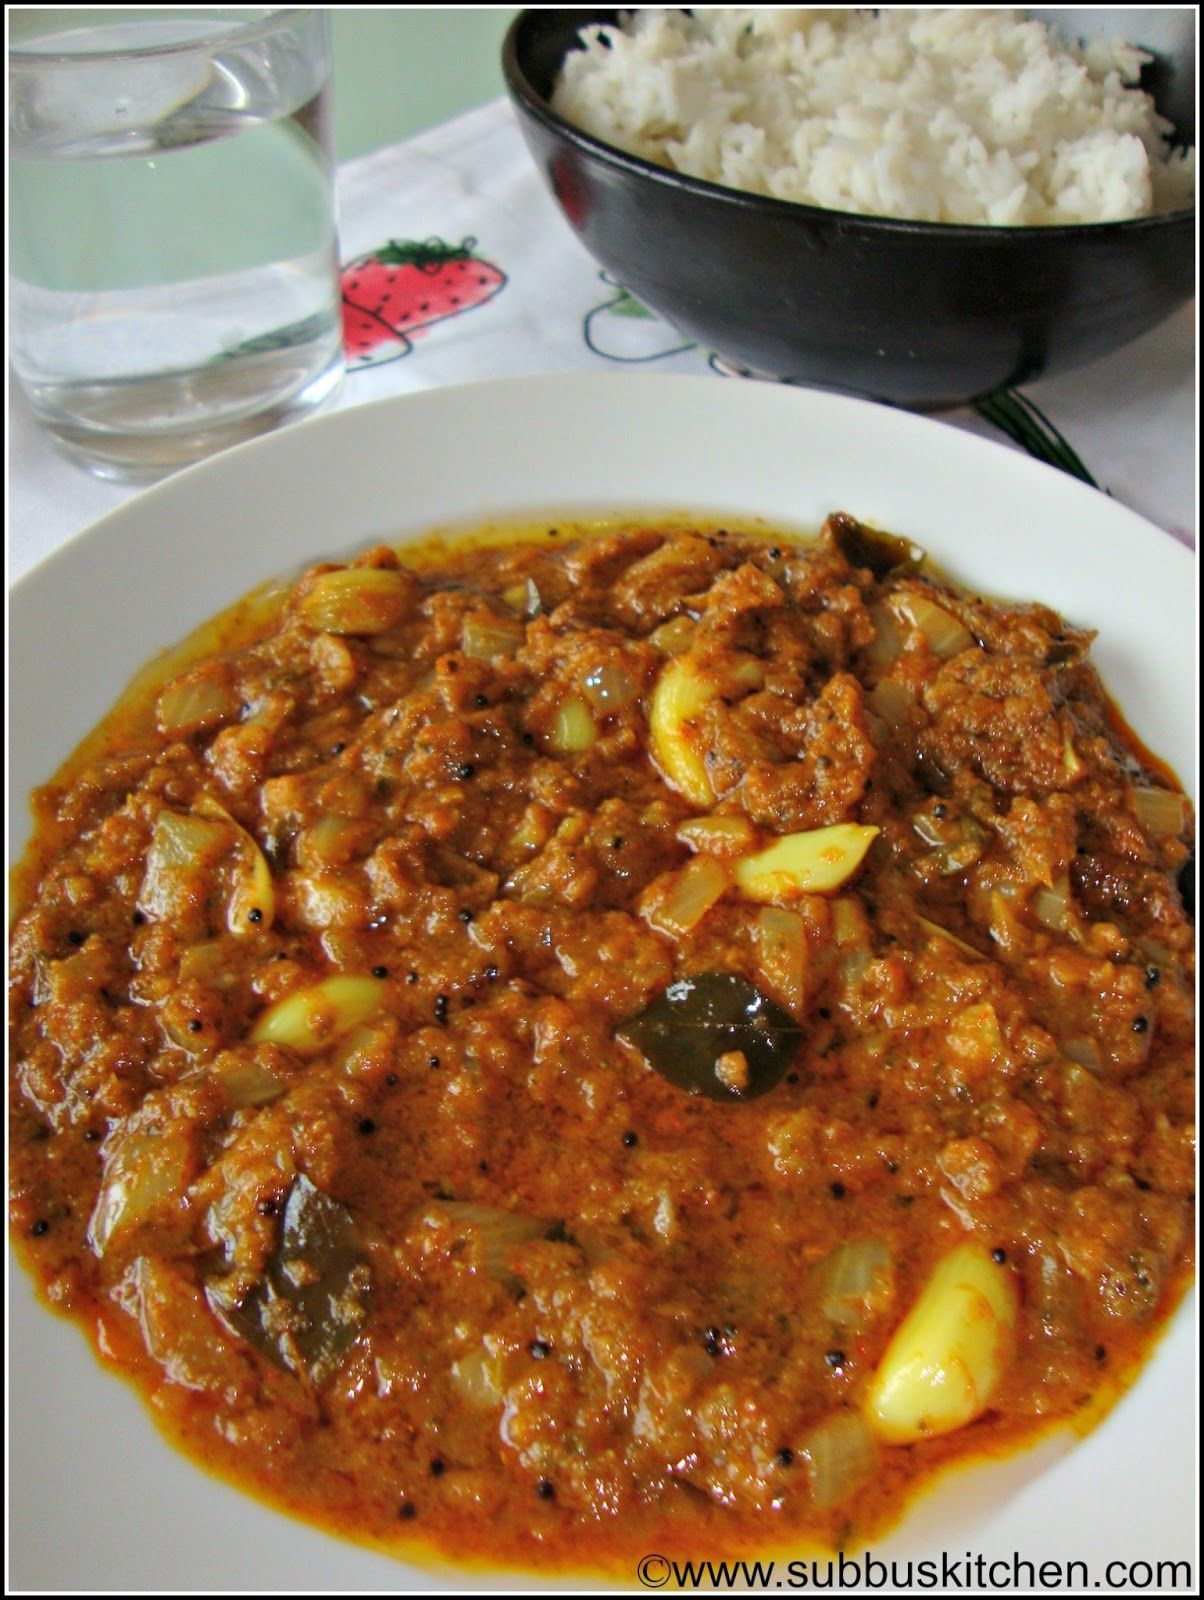 Poondu Karivepillai Kuzhambu Garlic Curry Leaves Kuzhambu With Images Veg Recipes Indian Food Recipes Vegetarian Recipes